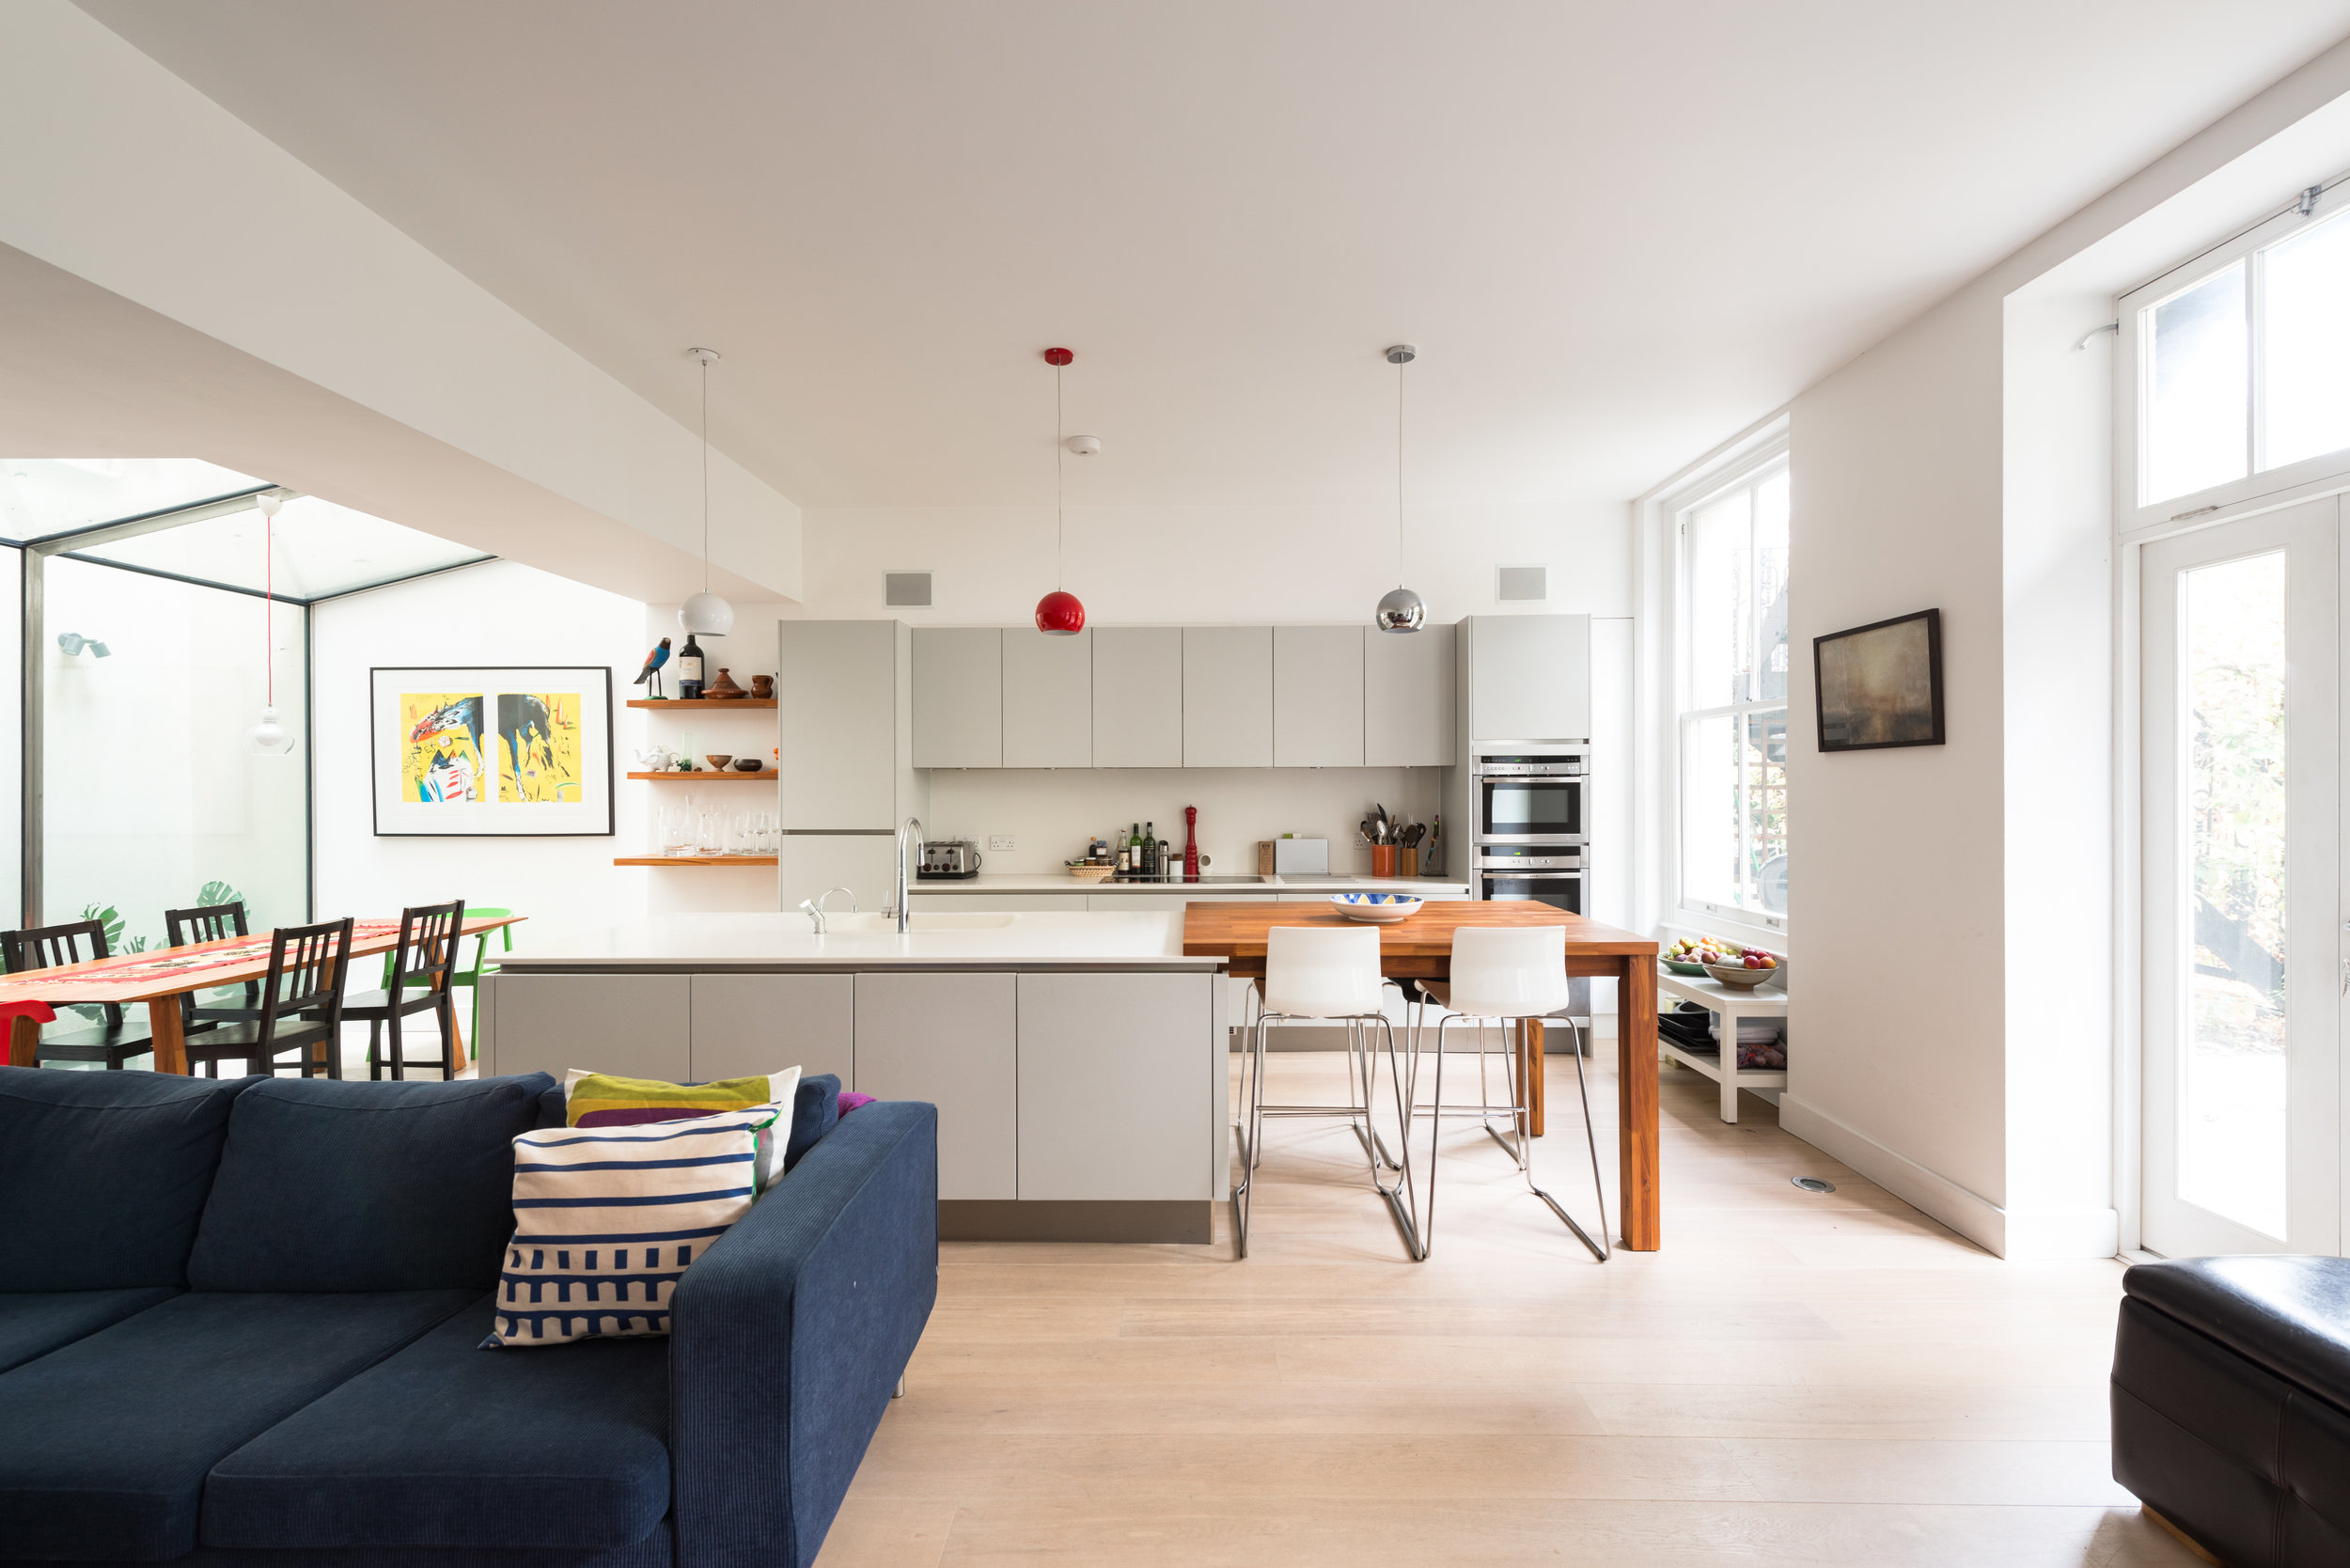 Warrington Crescent Kitchen - MW Architects